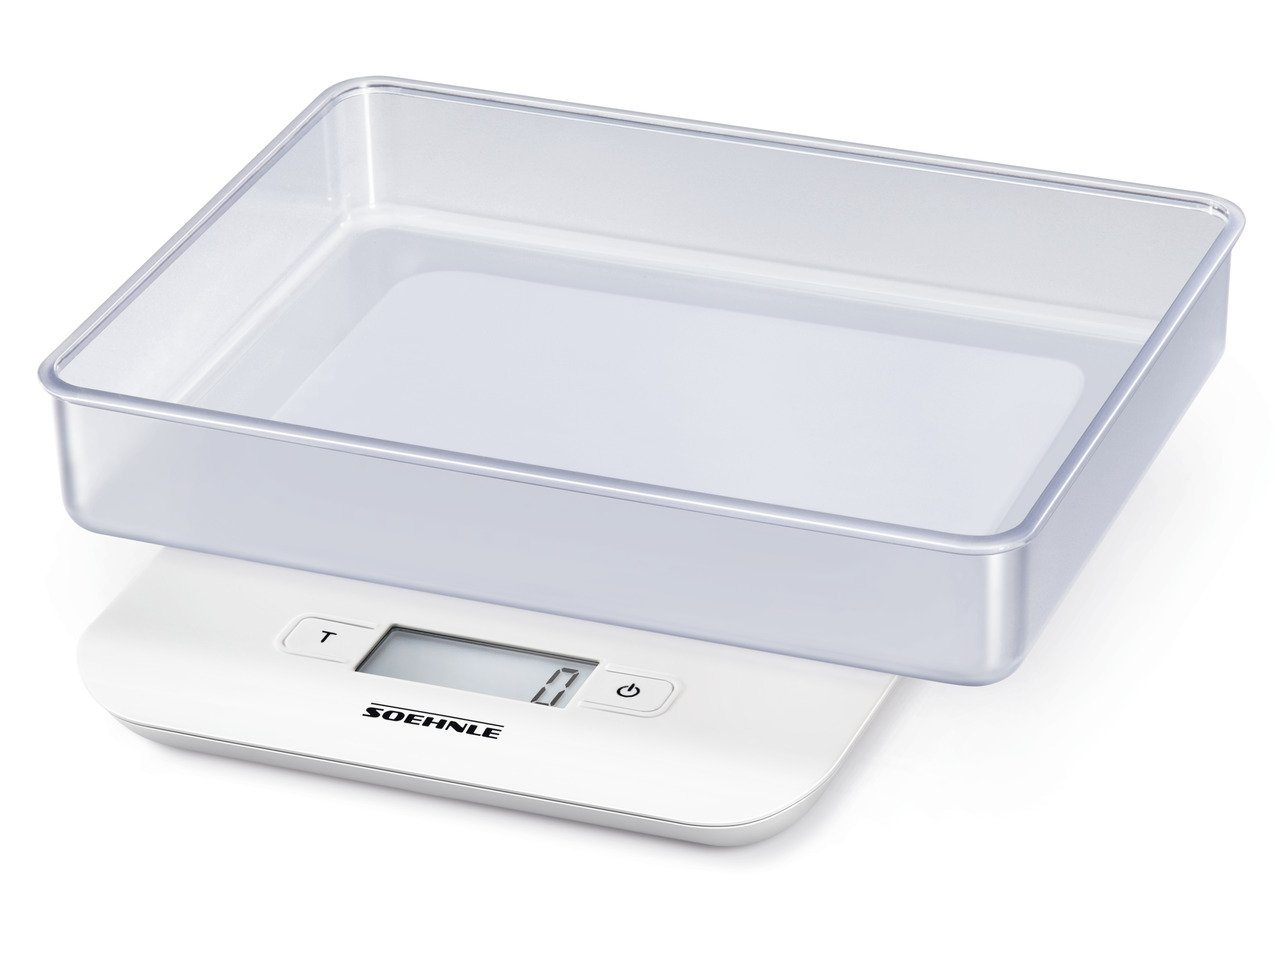 Soehnle 65122 Digitale Küchenwaage Compact: Amazon.de: Küche & Haushalt